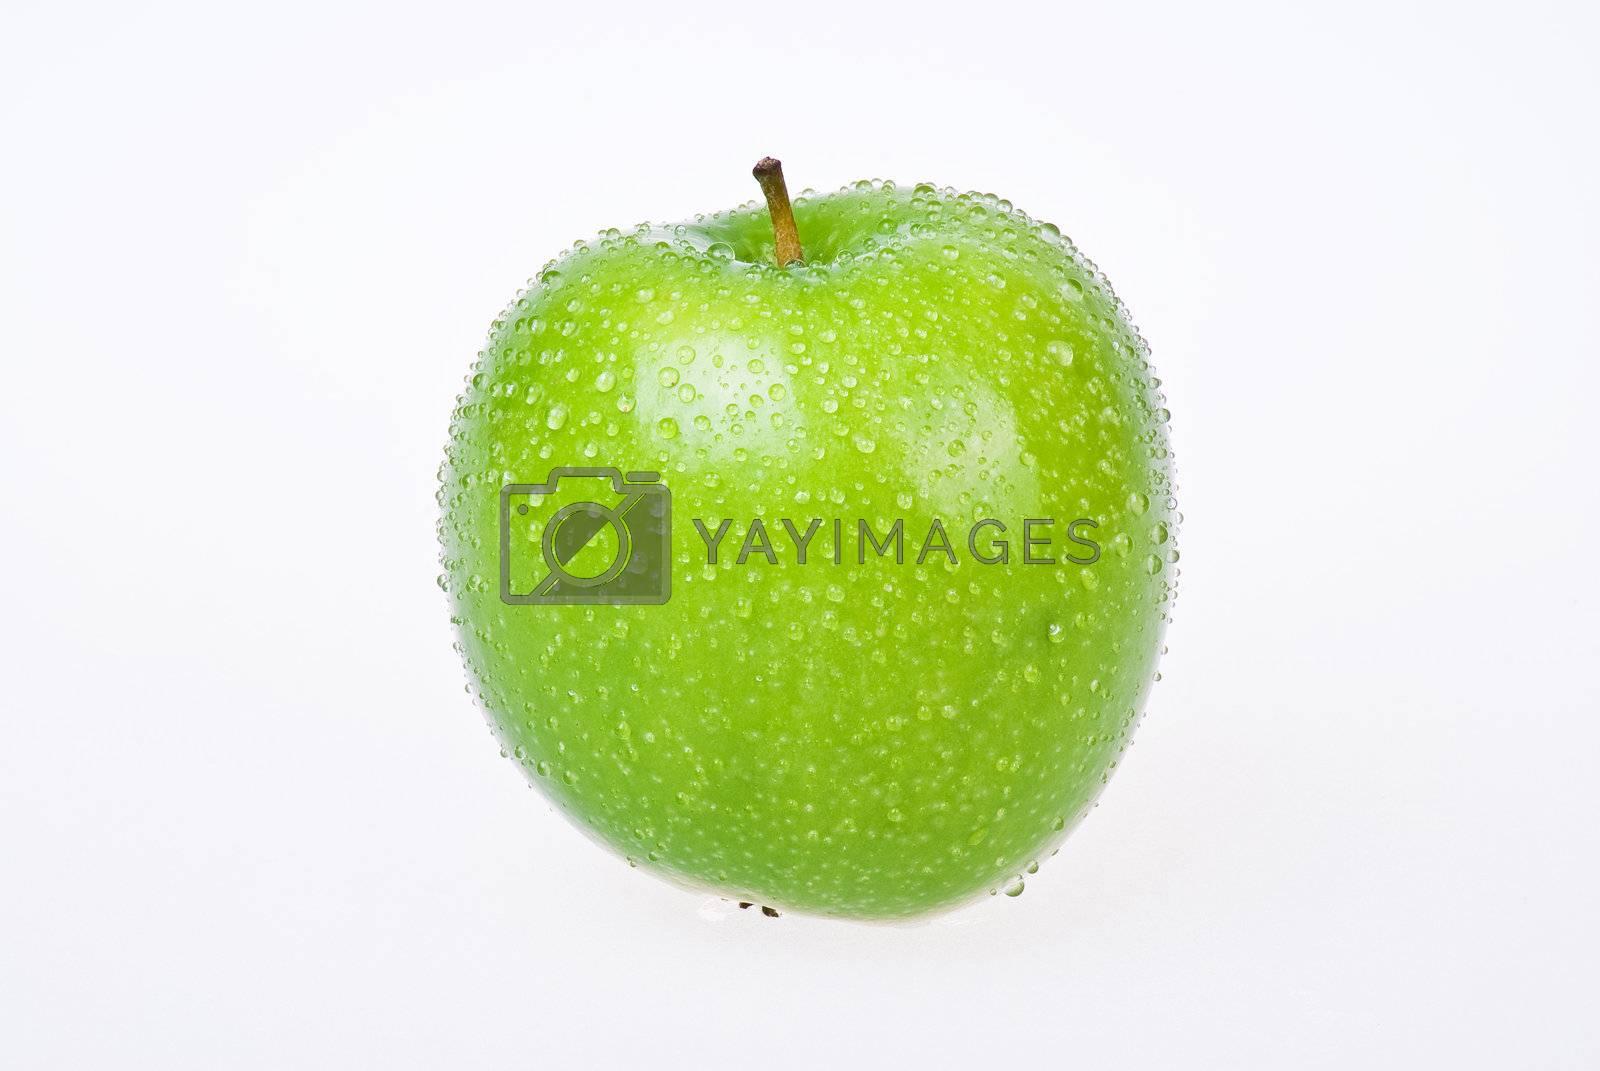 Green apple by caldix